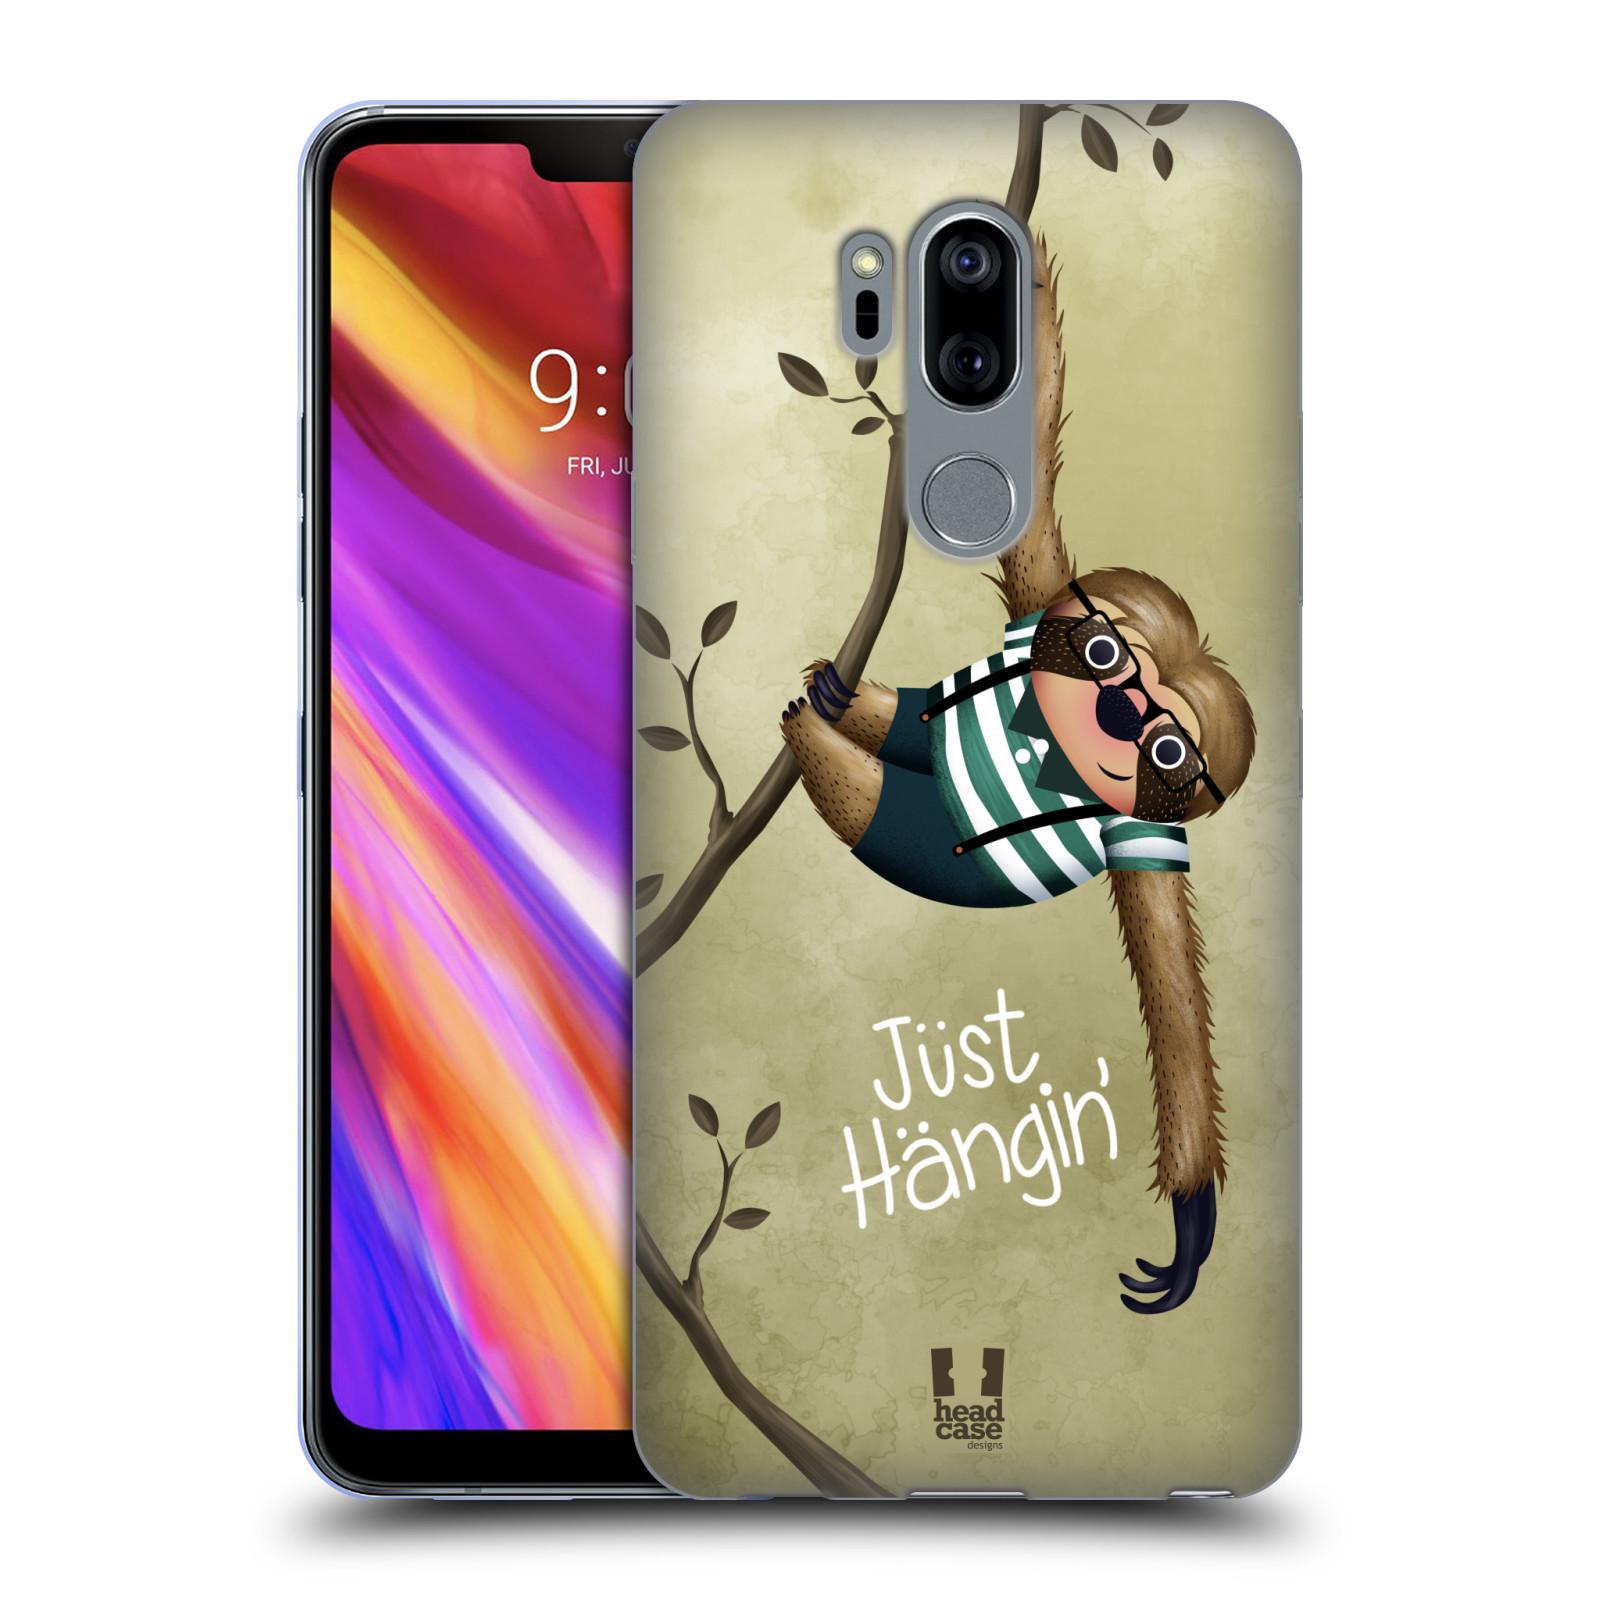 Silikonové pouzdro na mobil LG G7 ThinQ - Head Case - Lenochod Just Hangin